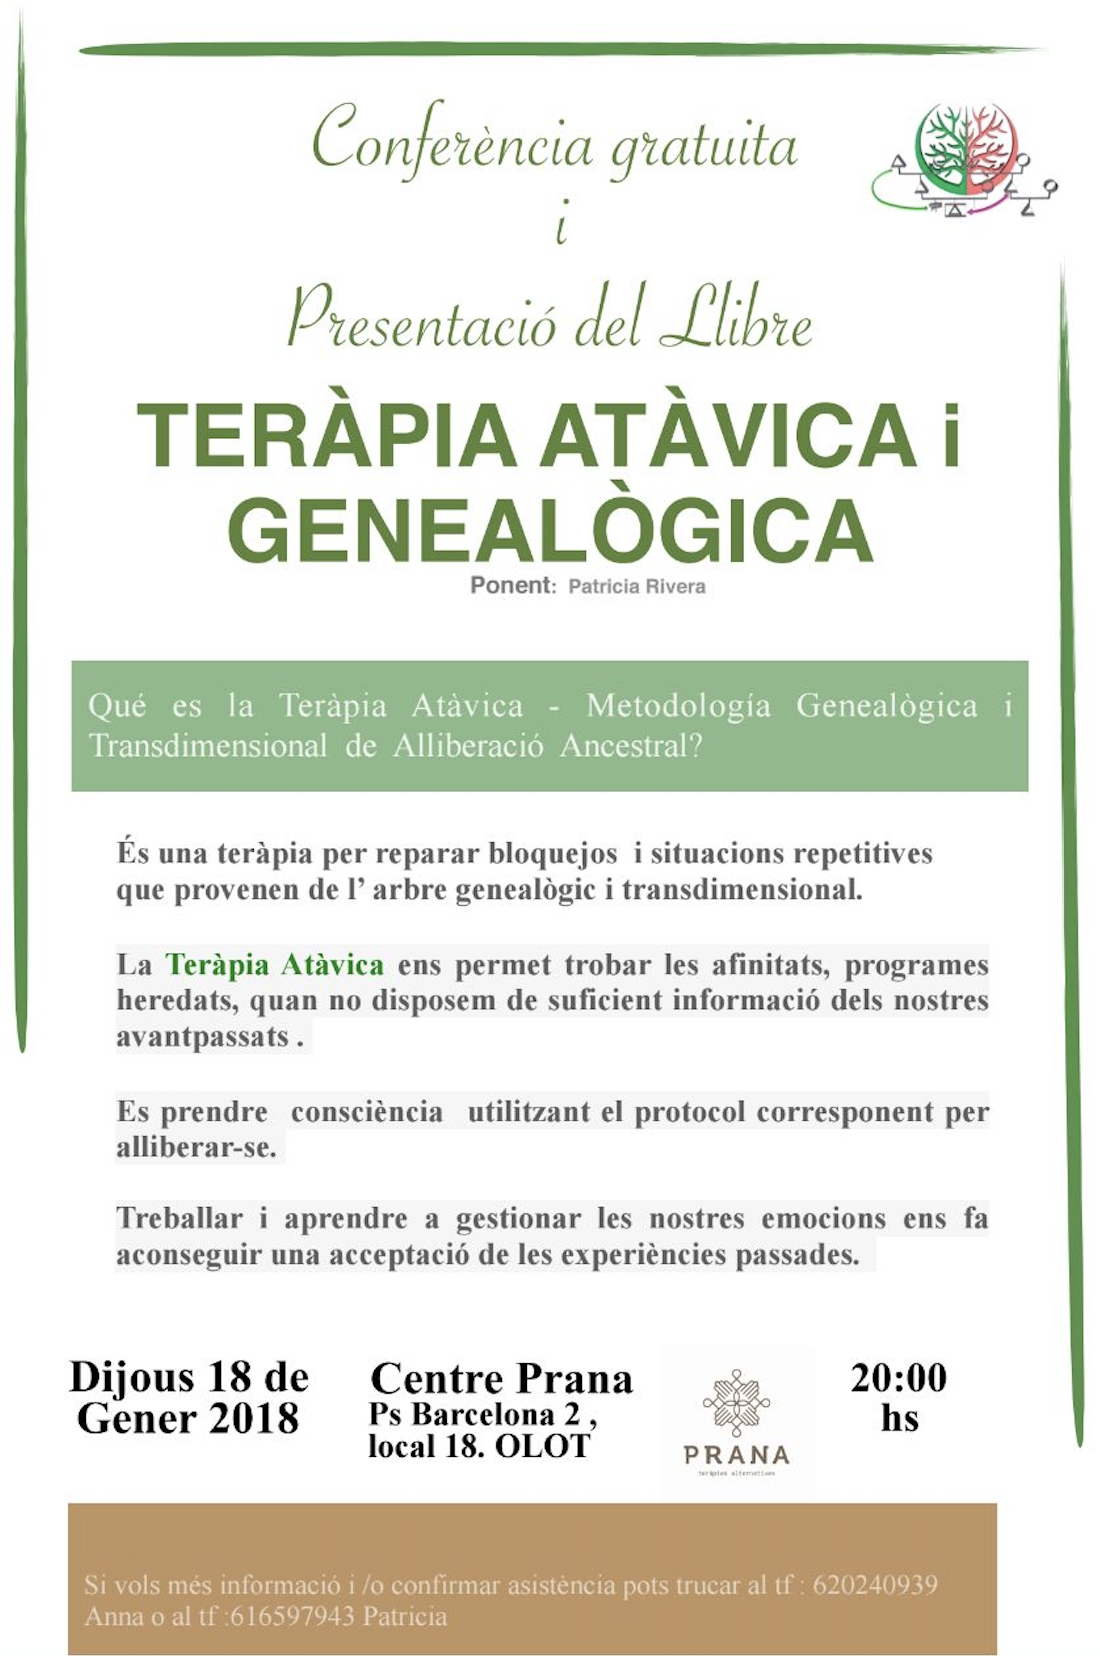 Teràpia Atàvica i Genealògica